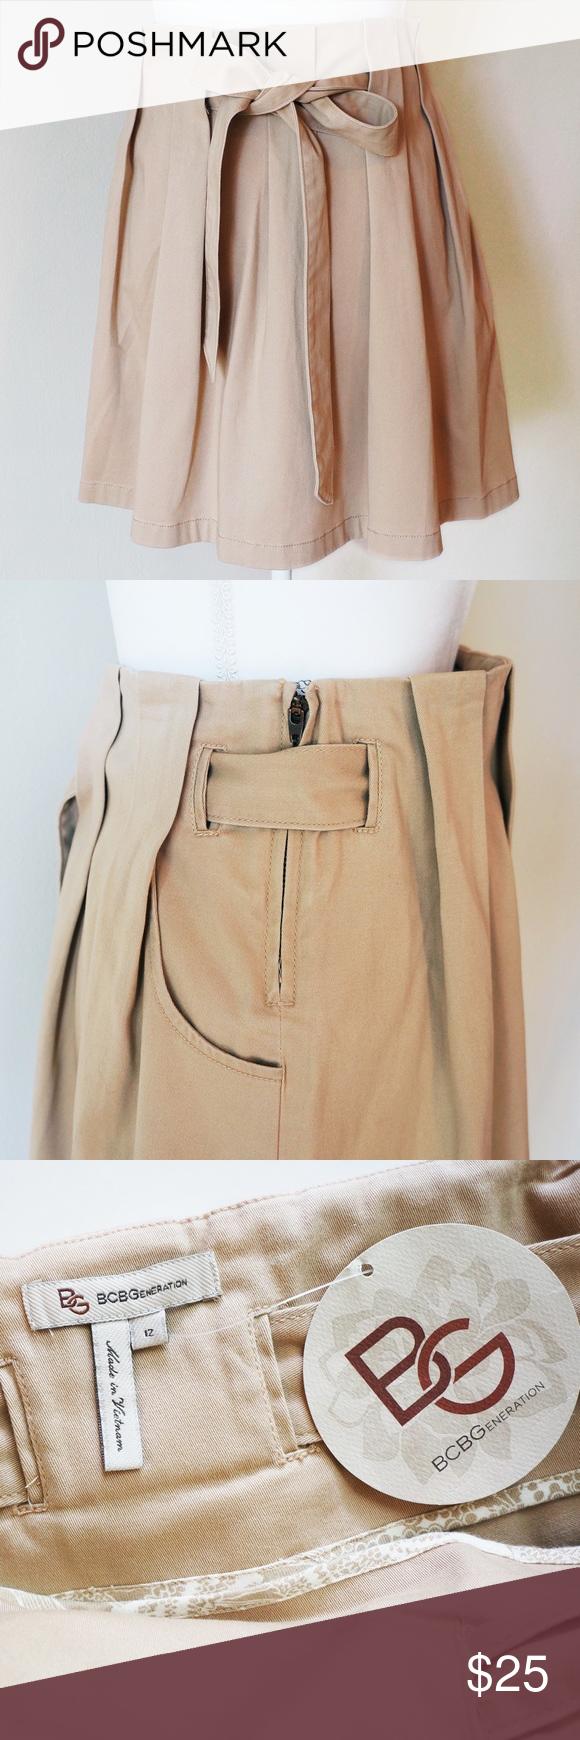 a18a75dea0 NWT BCBGeneration khaki pleated twill skirt NWT BCBGeneration khaki  paperbag pleated twill skirt with tie belt